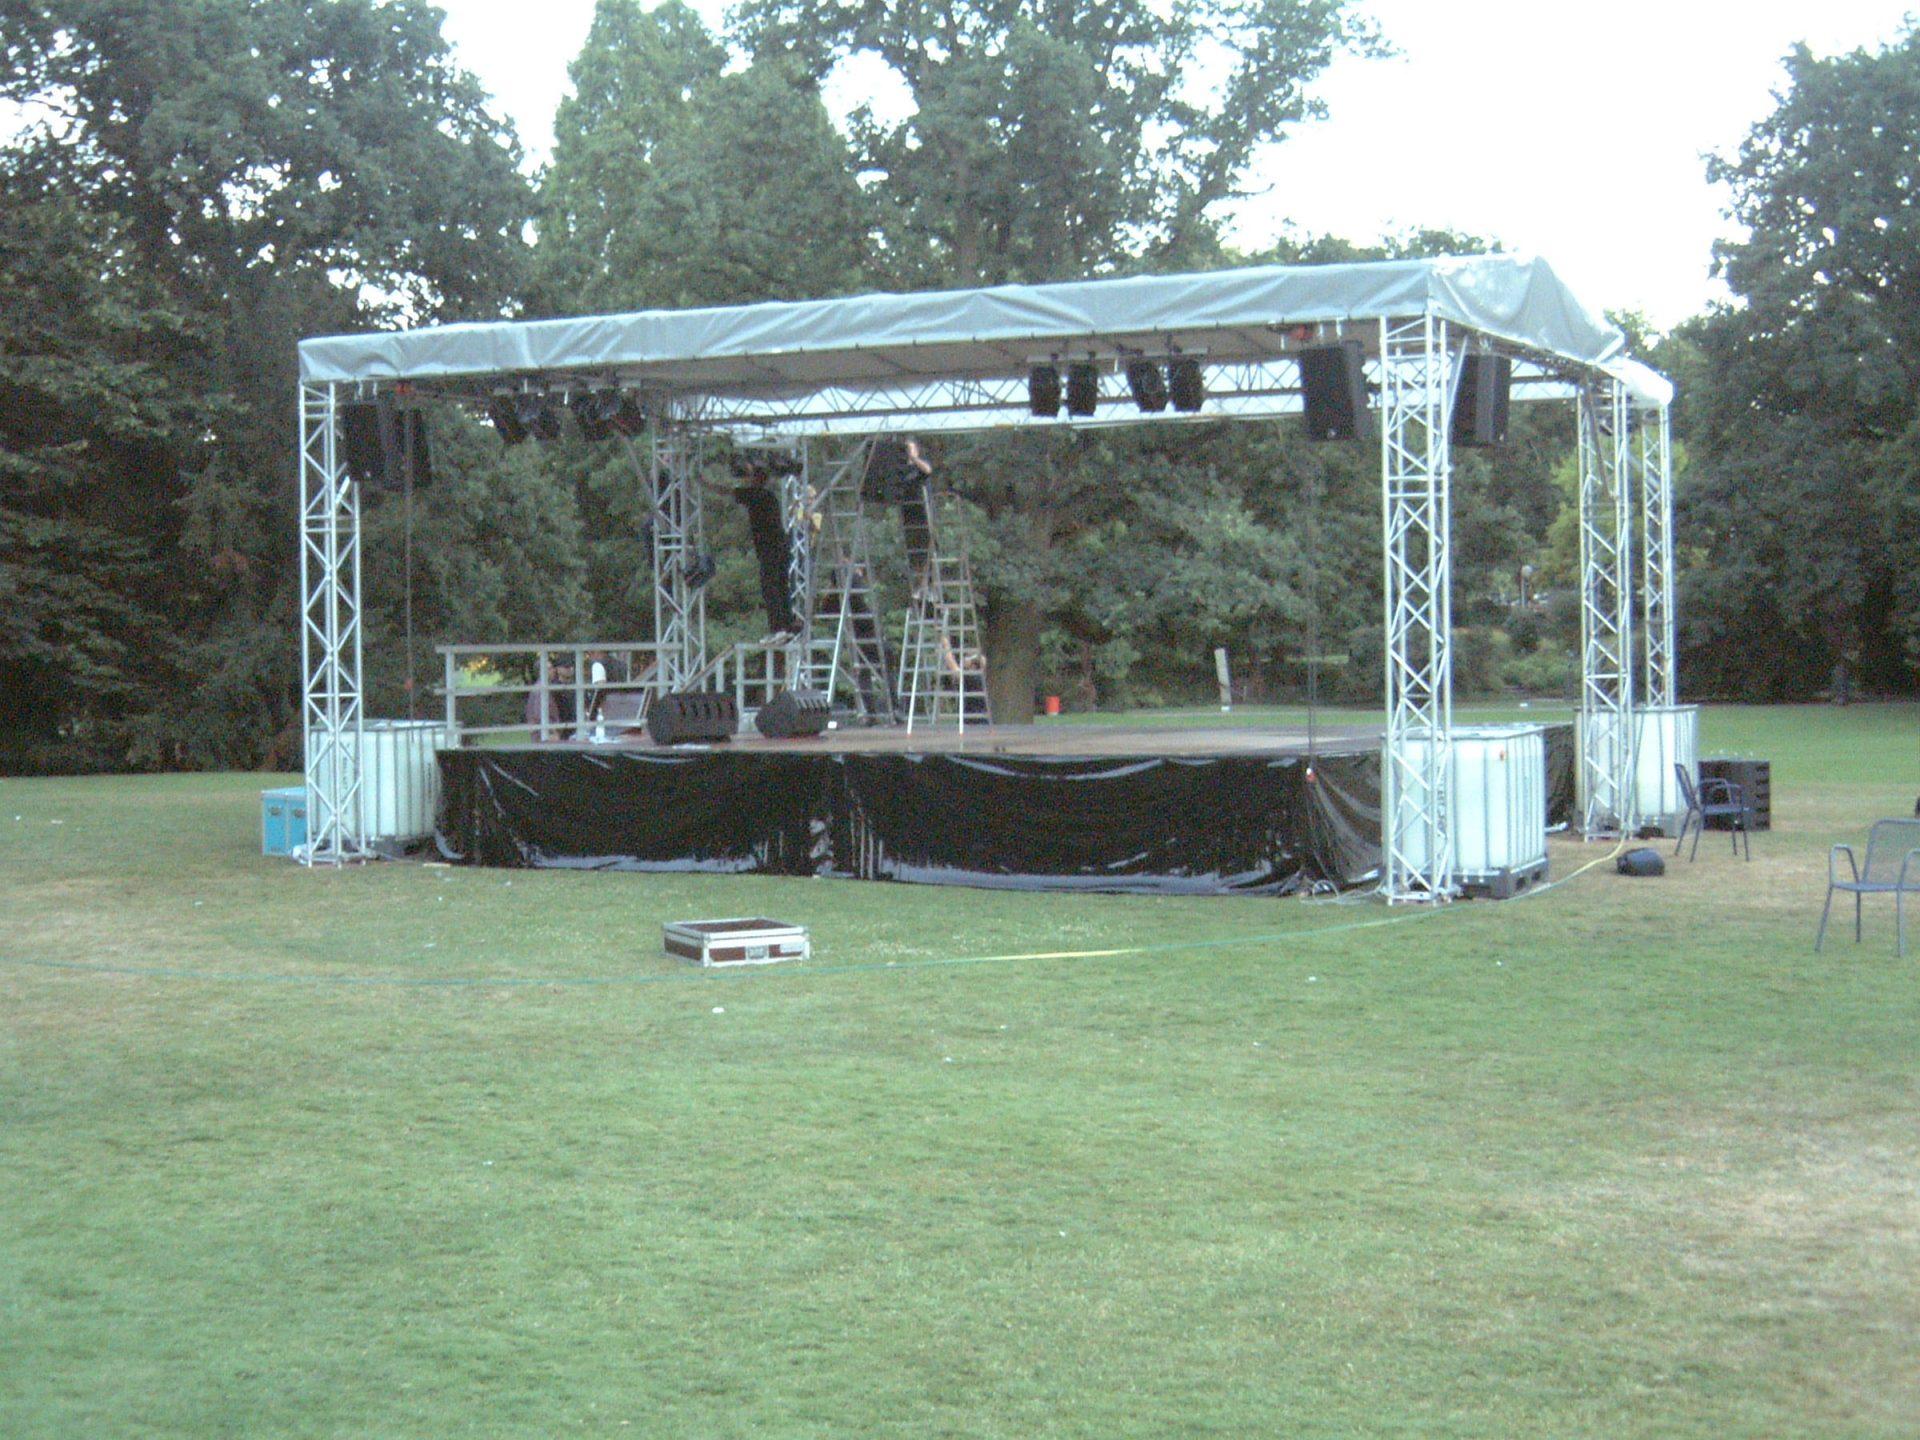 Bühne im Park